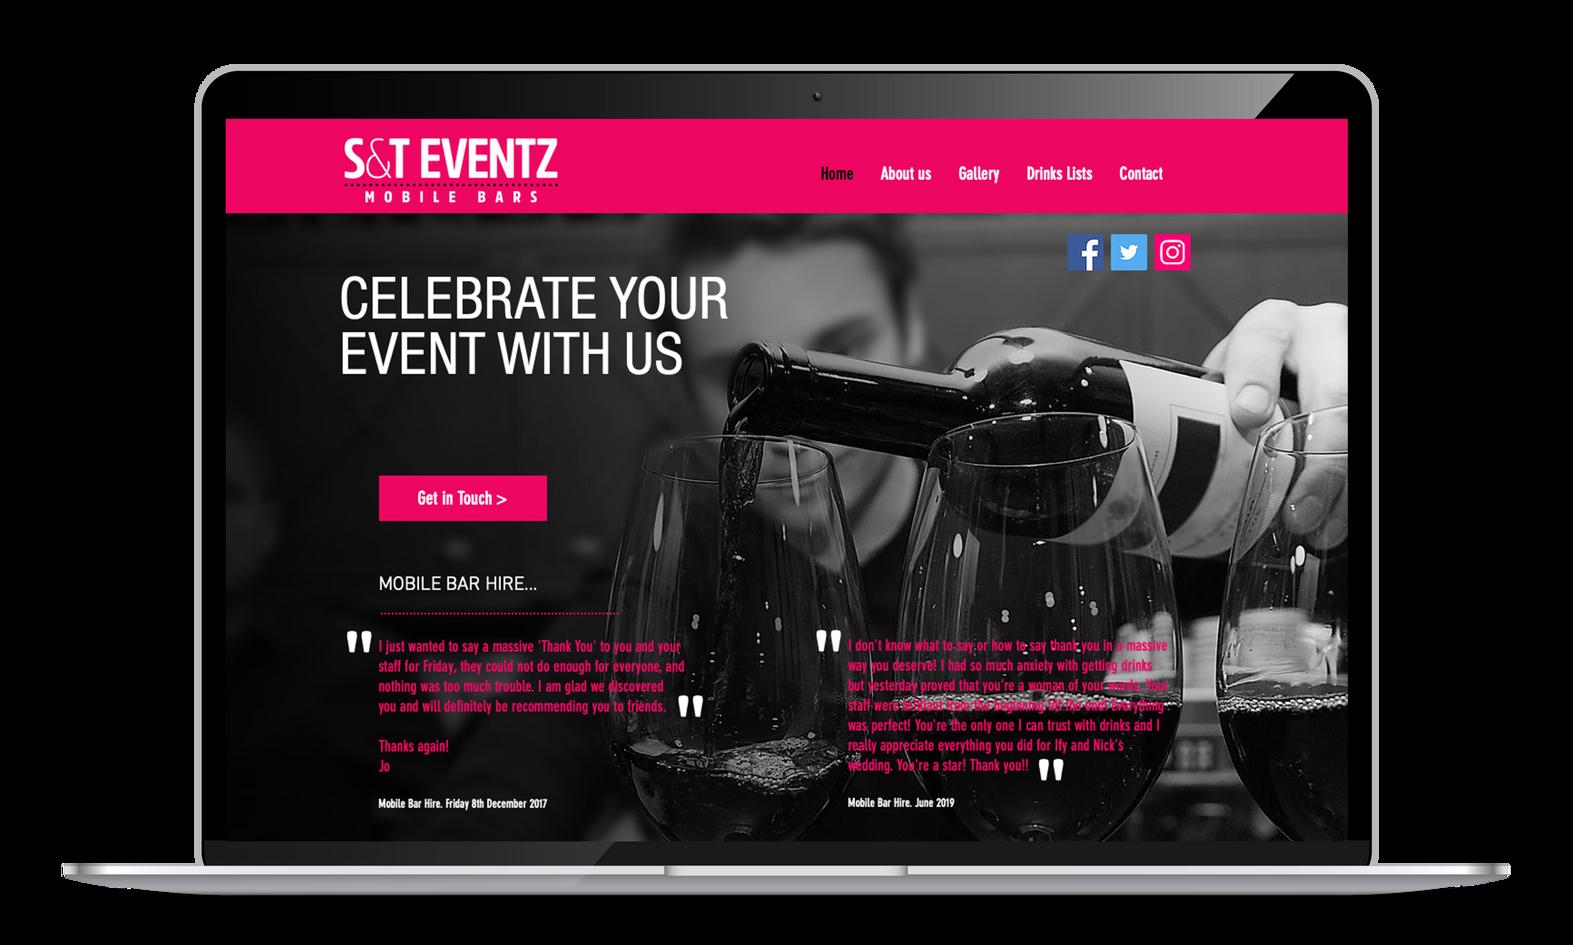 ST Eventz  I  Mobile Bar Hire